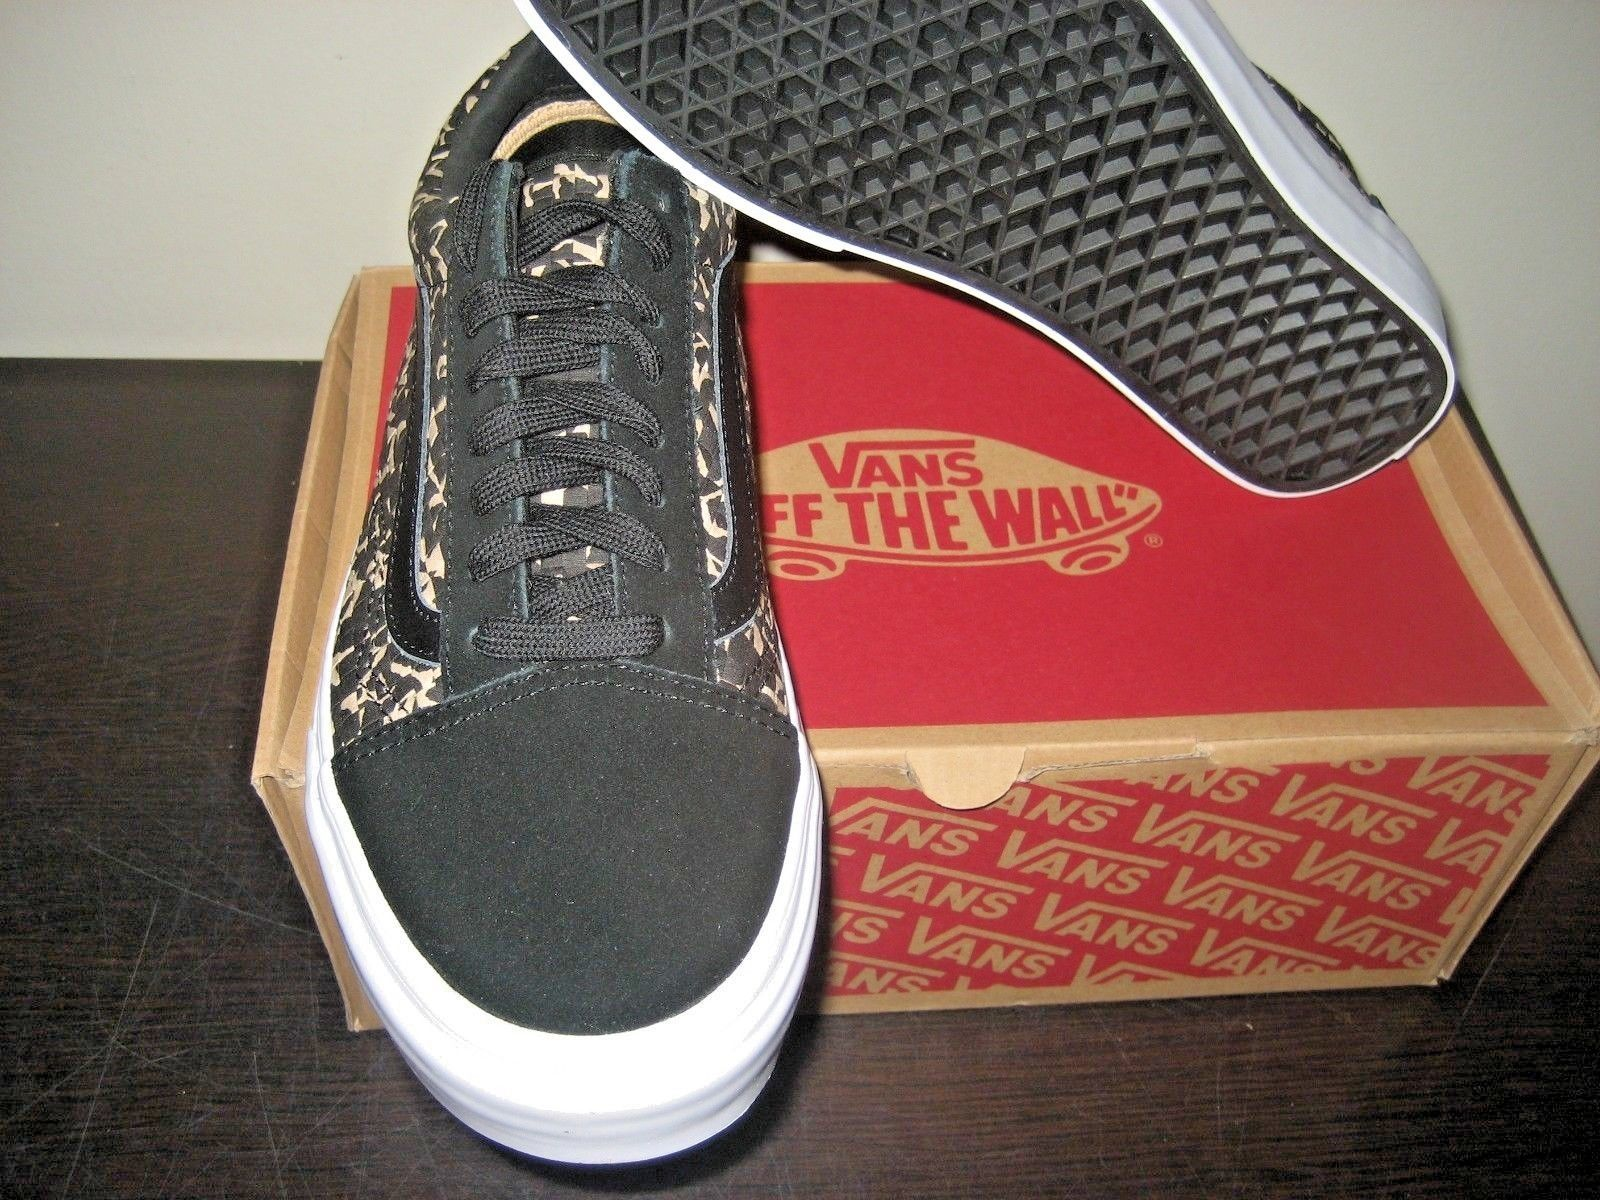 f2a1d016ac ... Vans Mens Old Skool DX Woven Textile Multi Black Suede Skate shoes Size  8 NWT